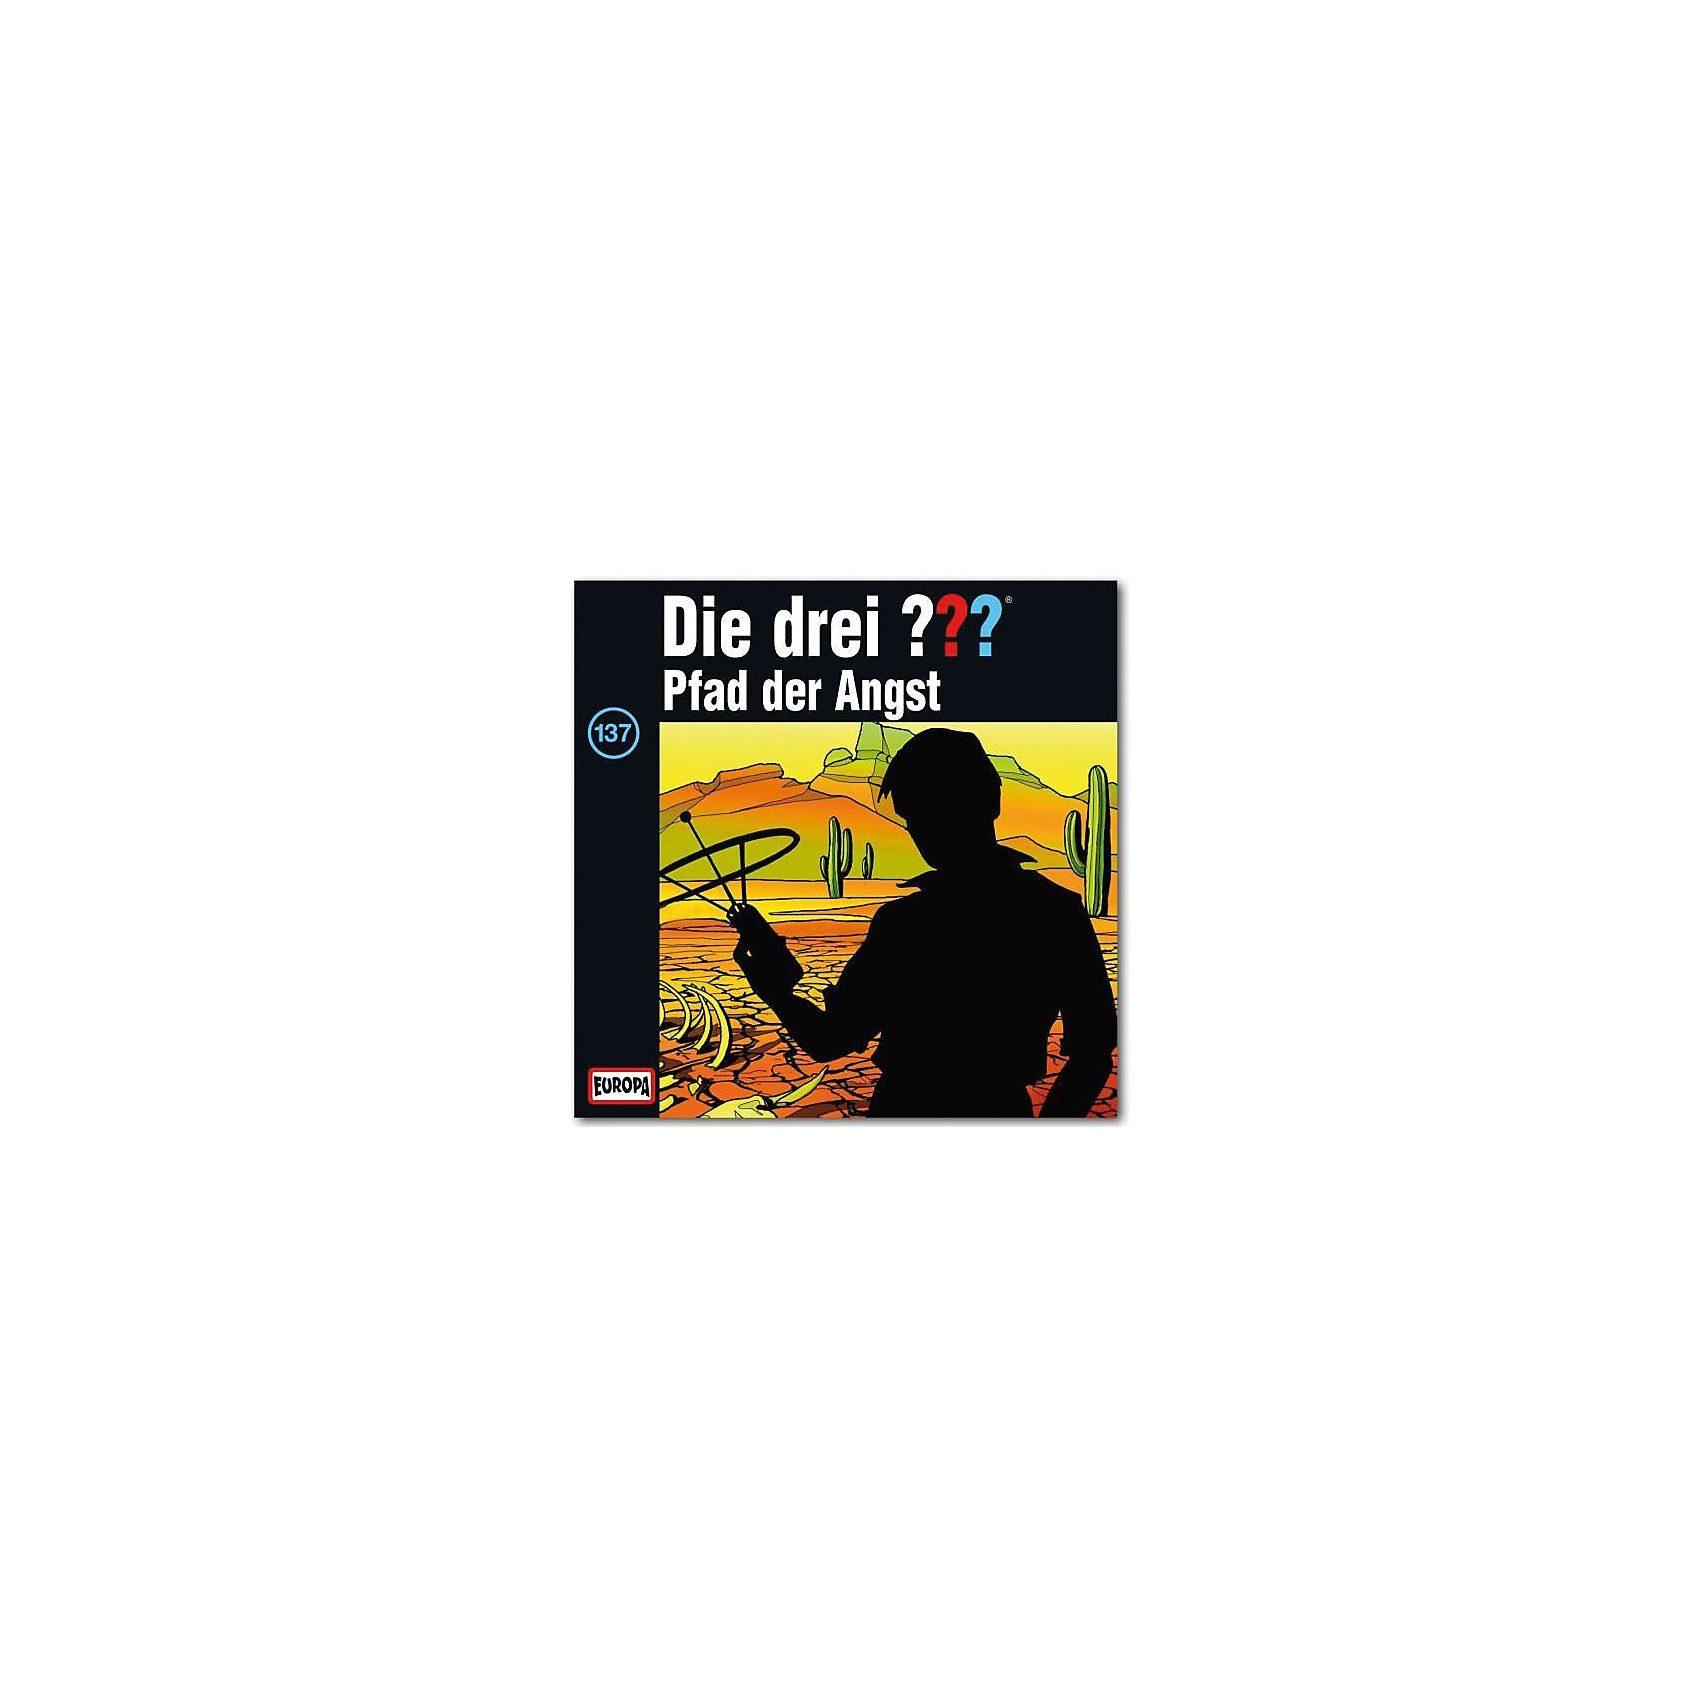 Sony CD Die Drei ??? 137 - Pfad der Angst